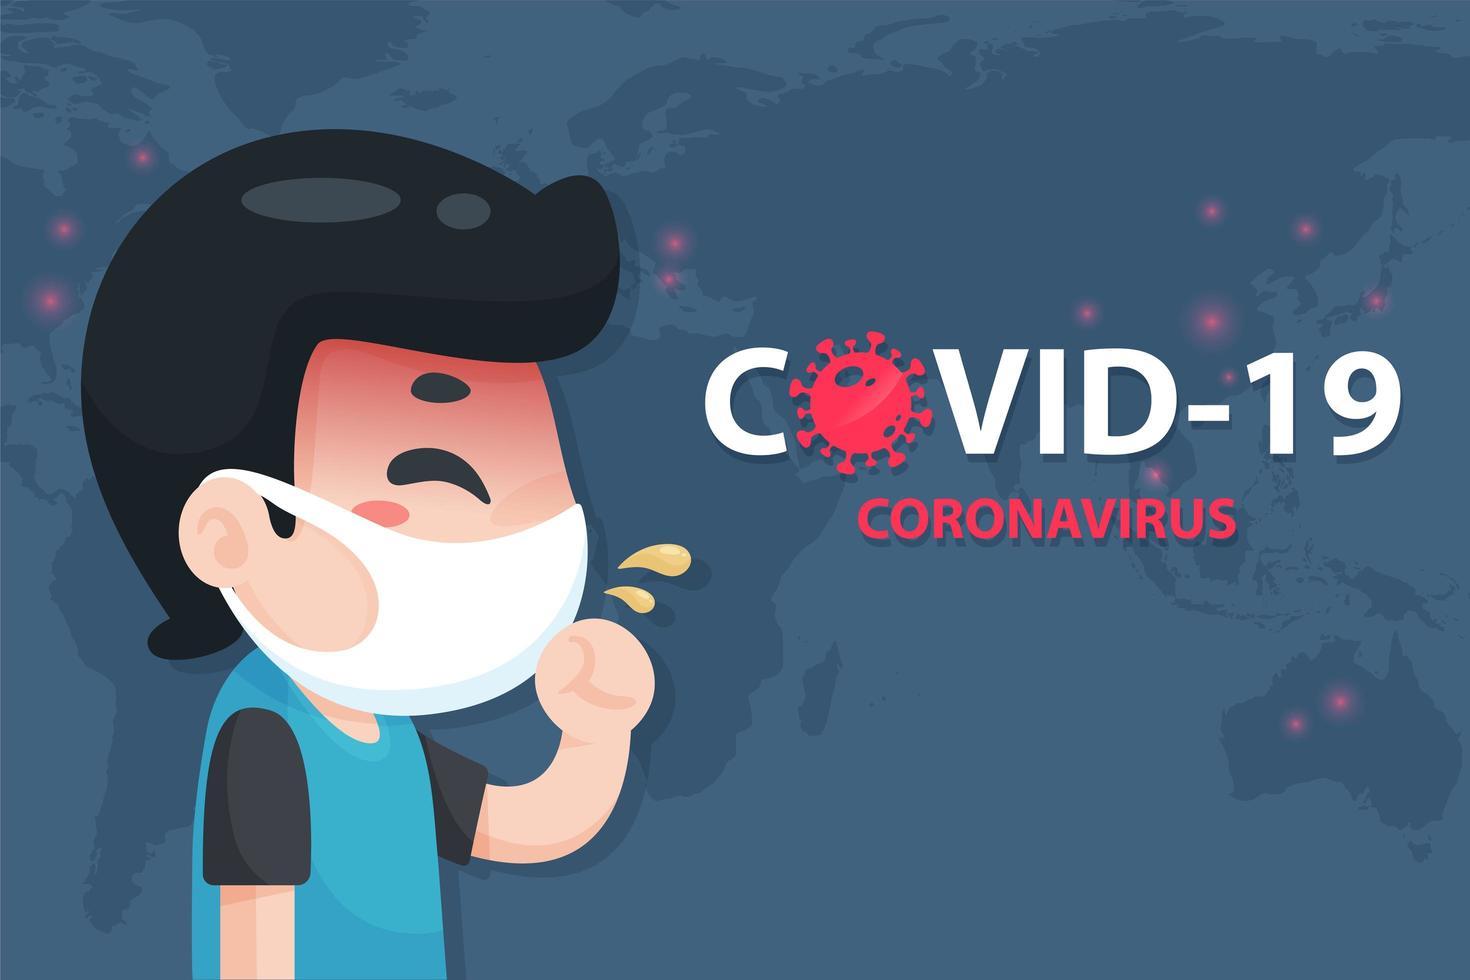 Cartoon Man with Coronavirus Symptoms Covid Poster  vector